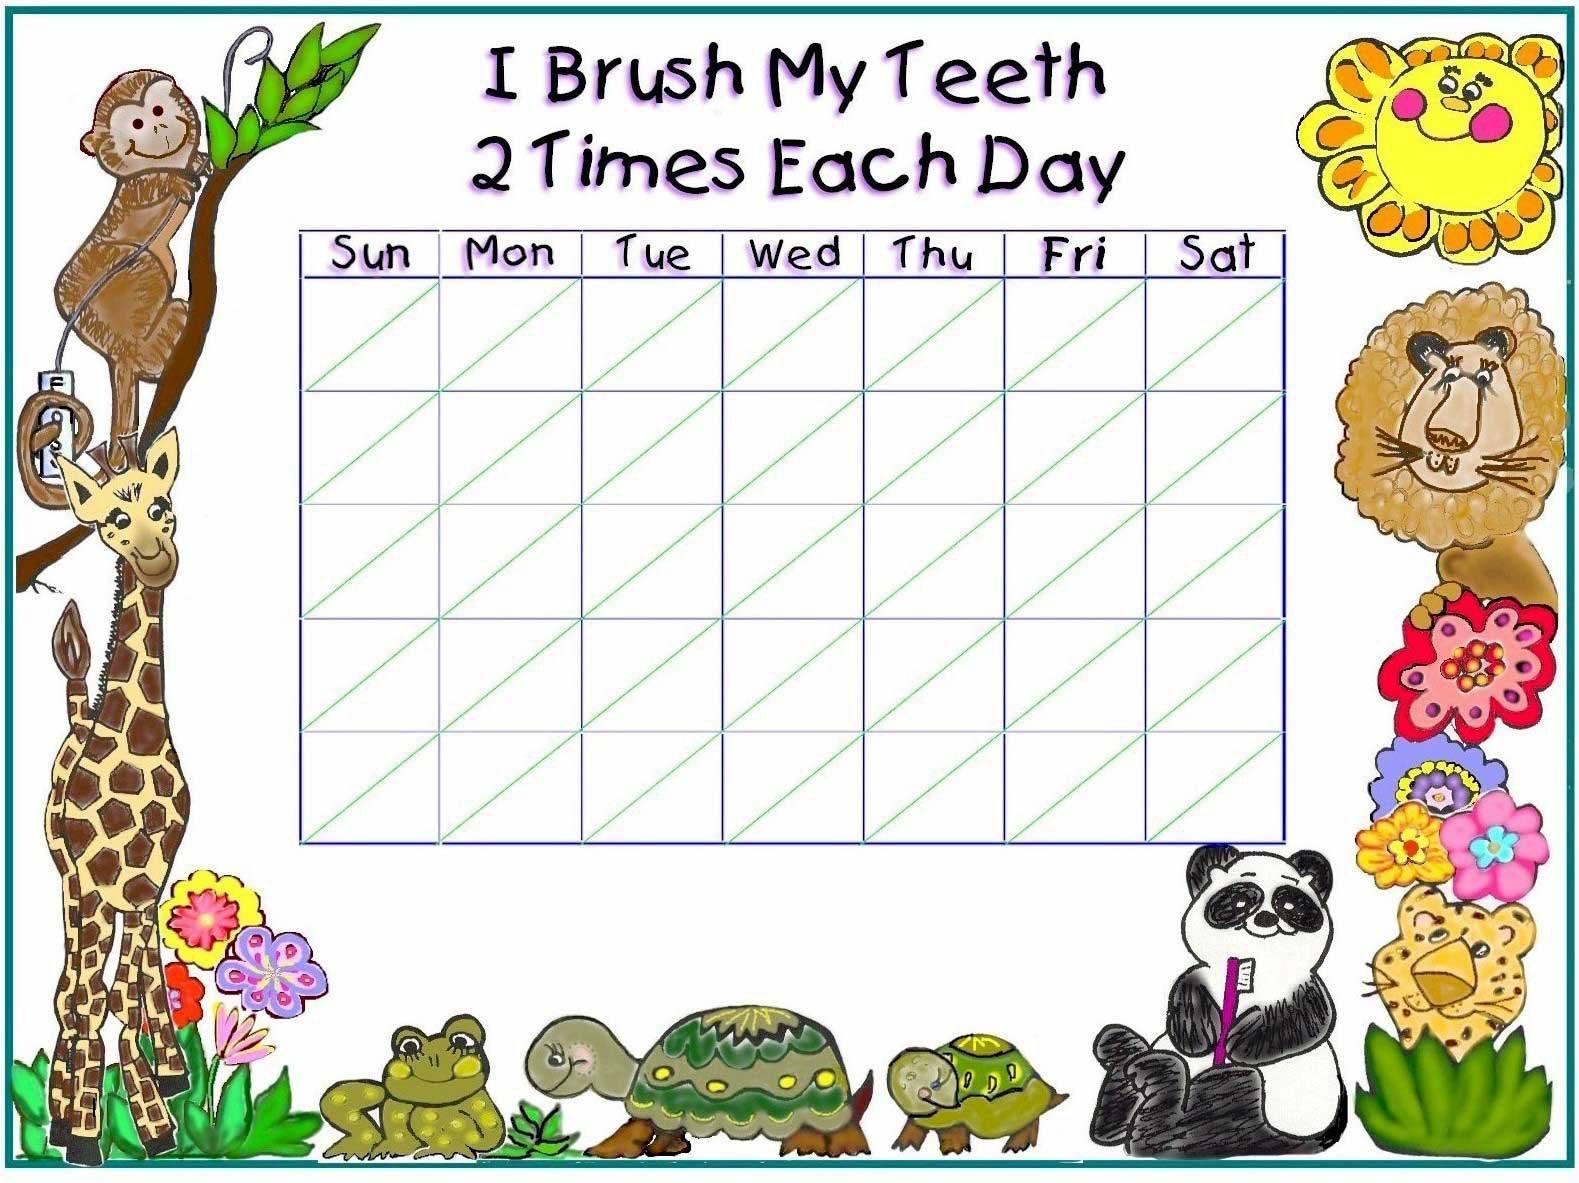 childrens-dental-health2